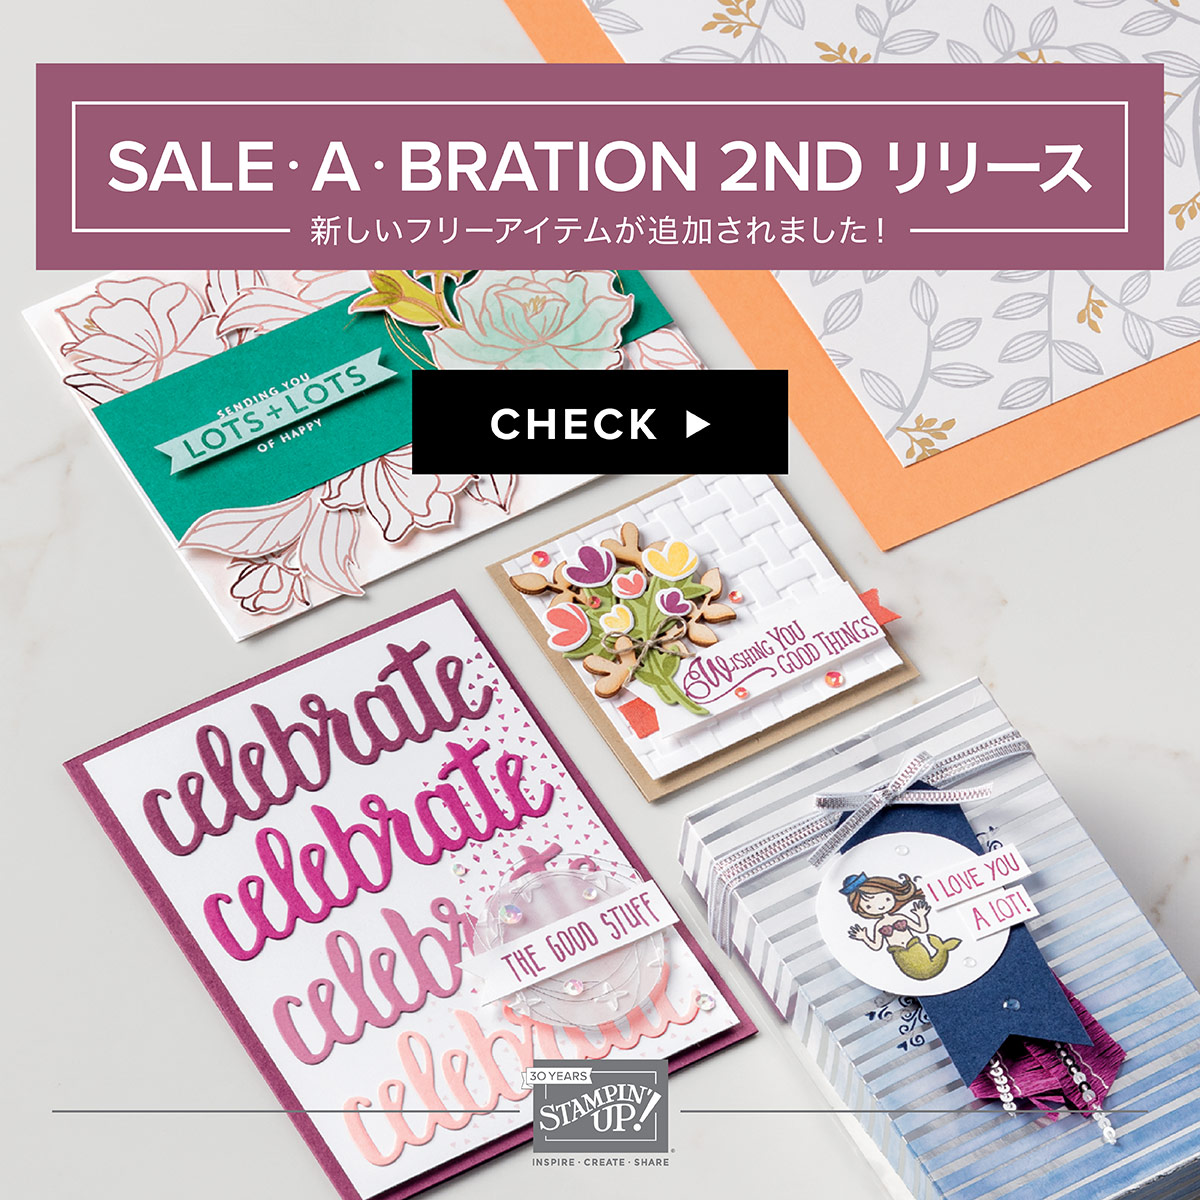 Sale-A-Bration (セラブレーション)・キャンペーン第2弾!